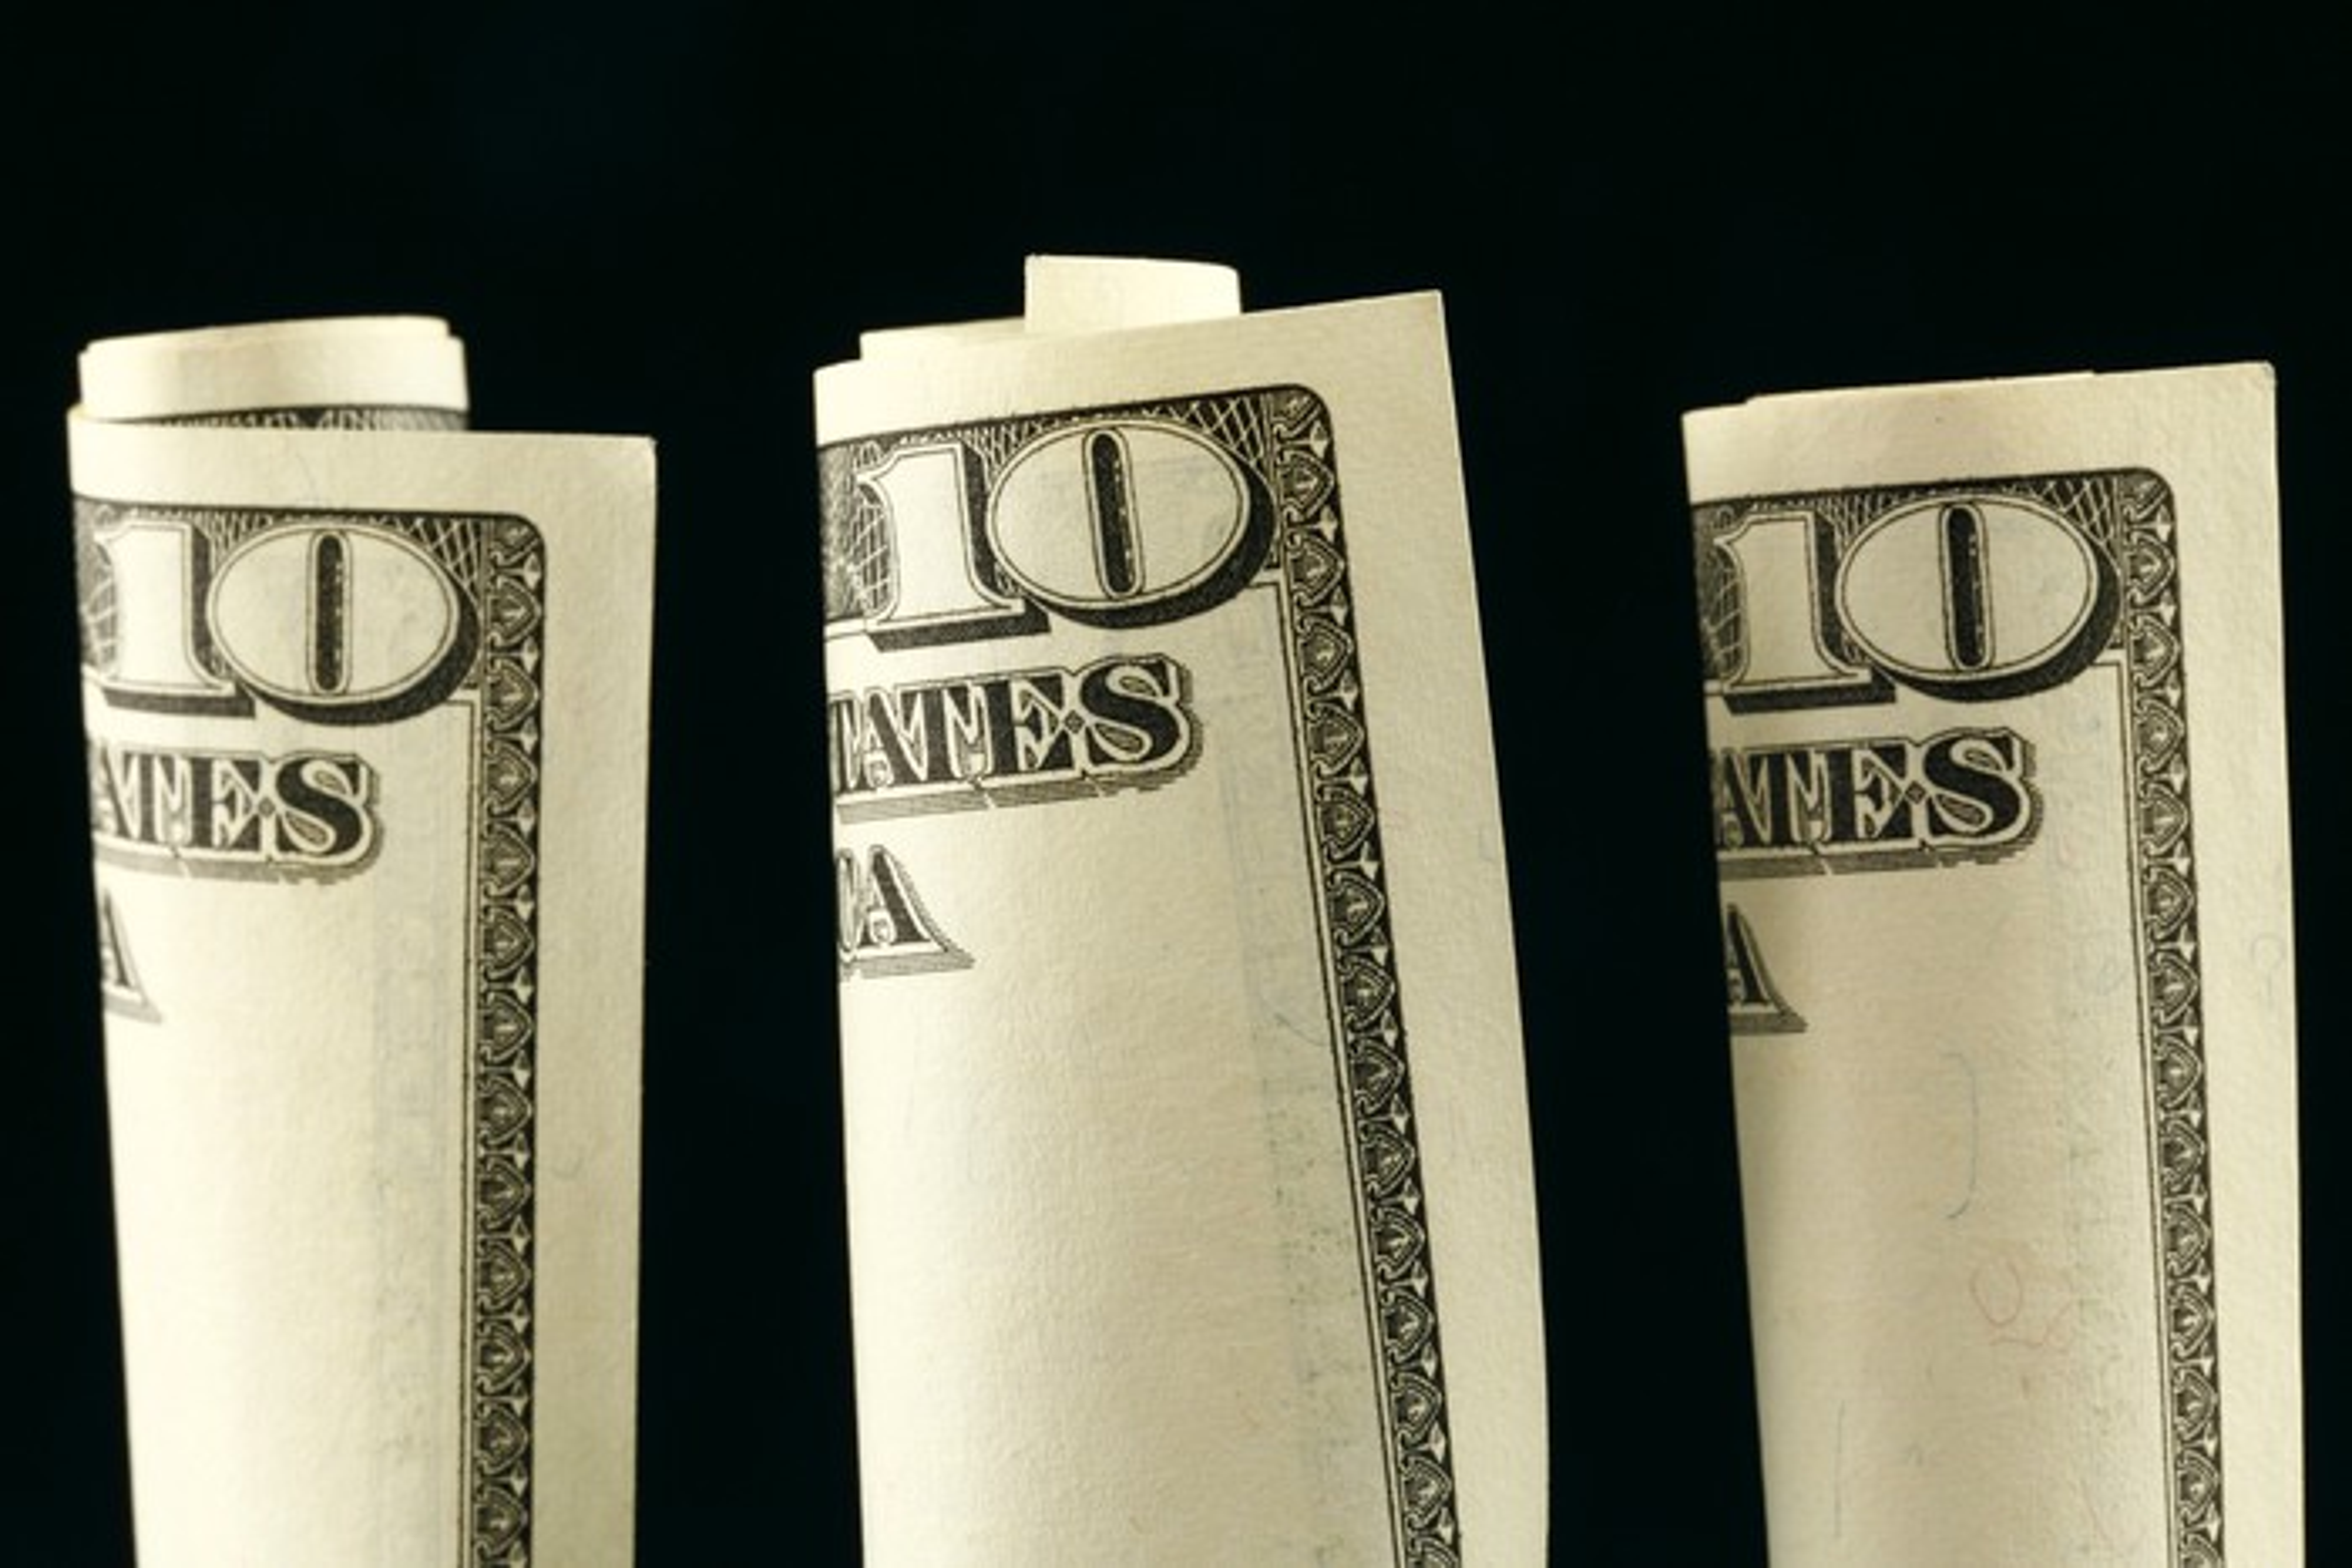 Three rolled-up $10 bills.